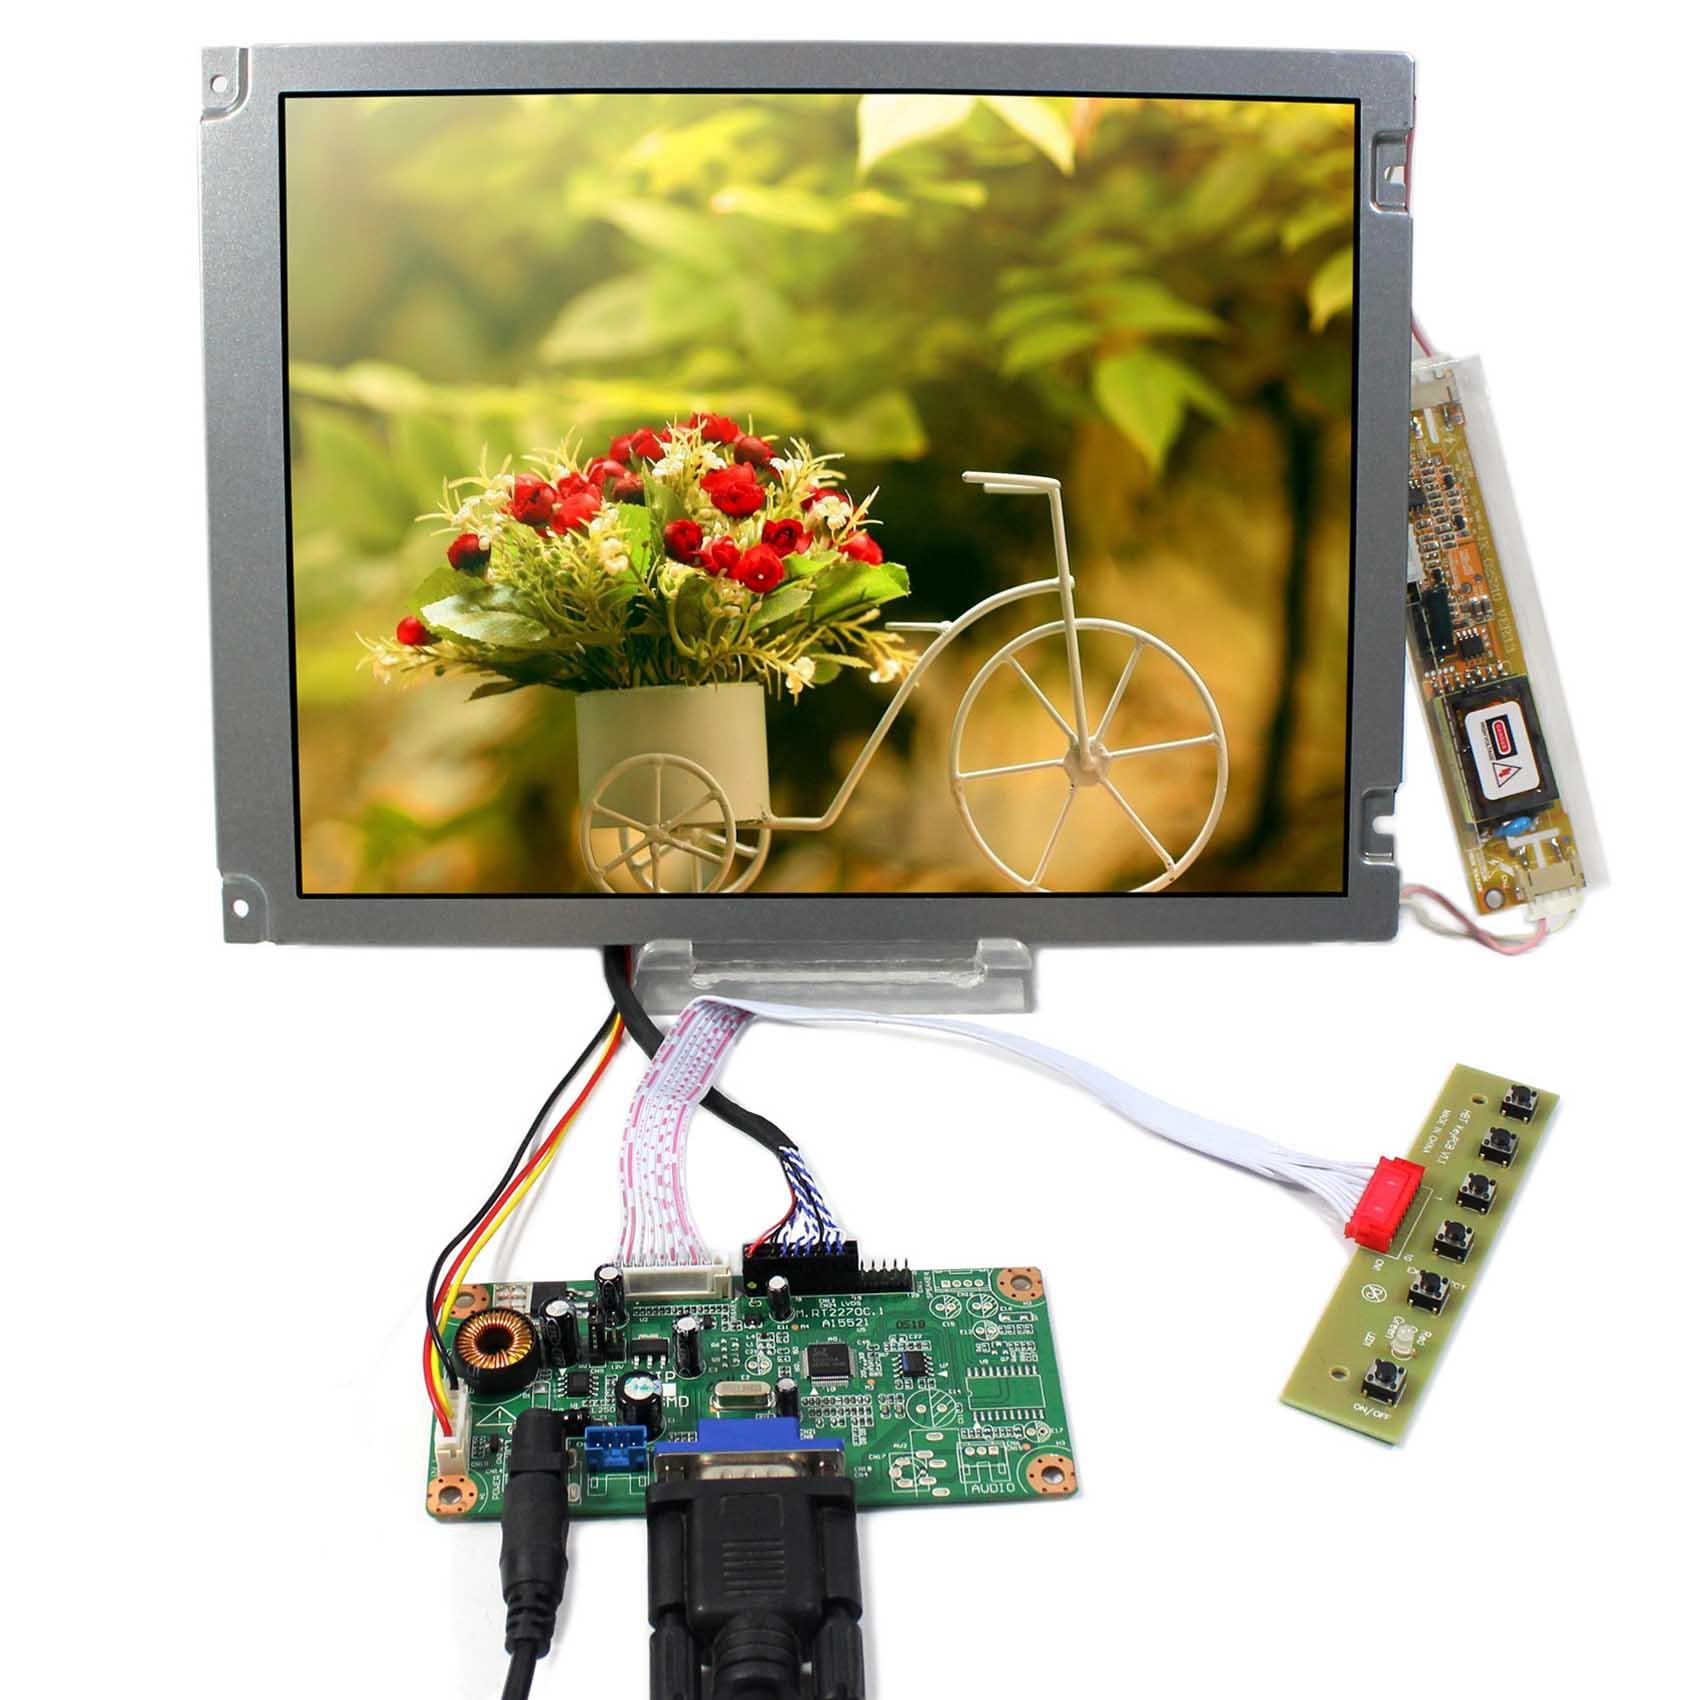 VGA signal input lcd controller board 10.4inch AA104SG04 800x600 LVDS lcd panelVGA signal input lcd controller board 10.4inch AA104SG04 800x600 LVDS lcd panel